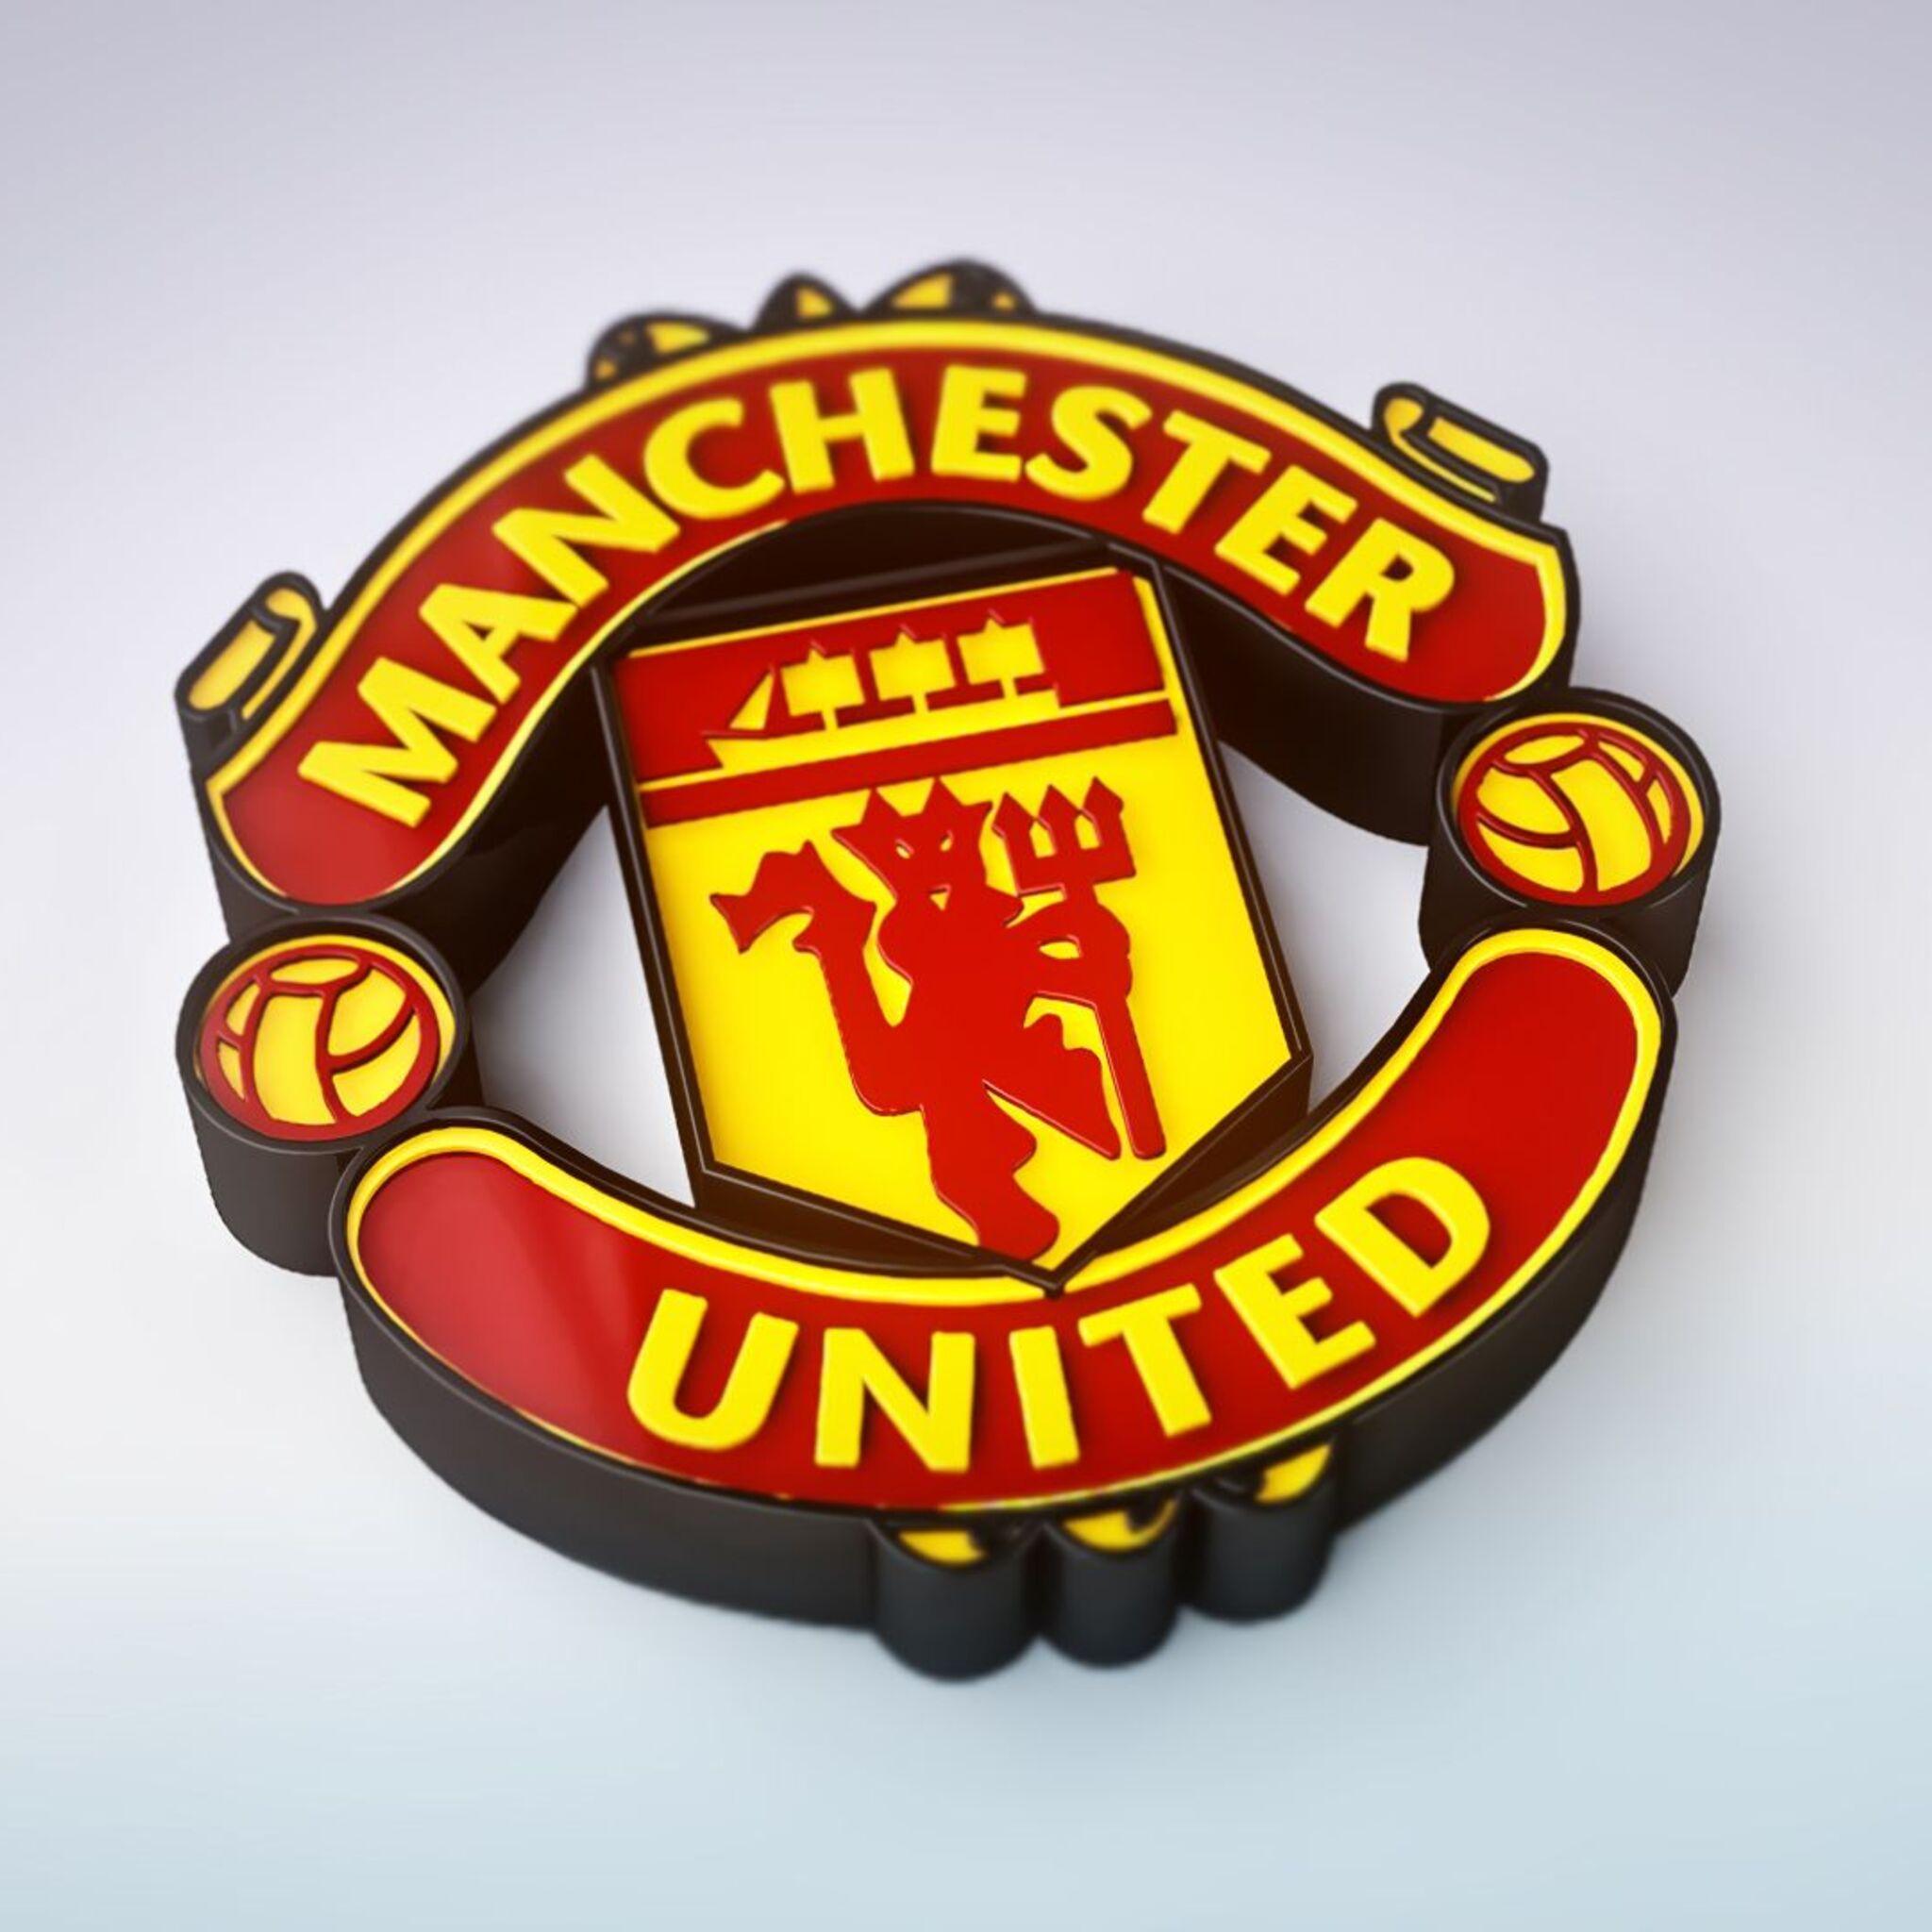 2048x2048 Manchester United 3D Logo Ipad Air HD 4k ... United Ilocandia Logo